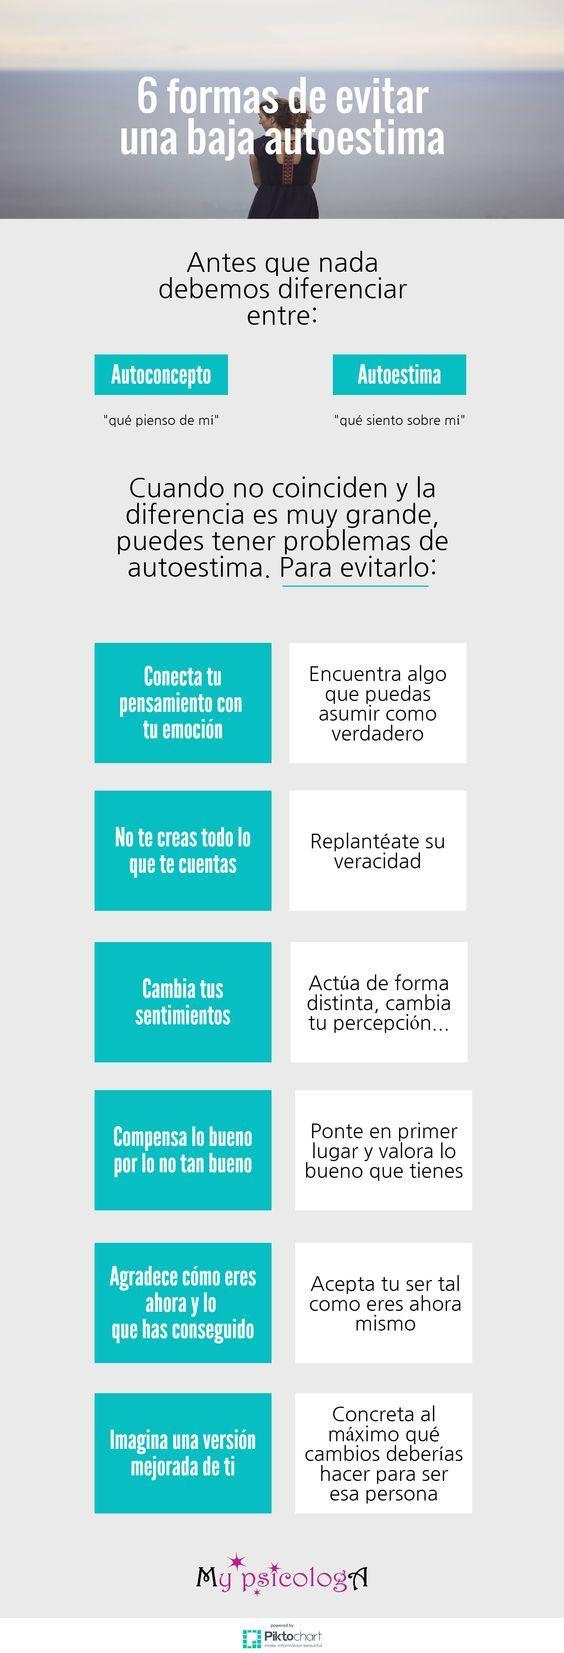 Aquí tenéis algunas pautas para evitar la baja autoestima #infografia #pinoftheday #autoestima #psicologia #coaching